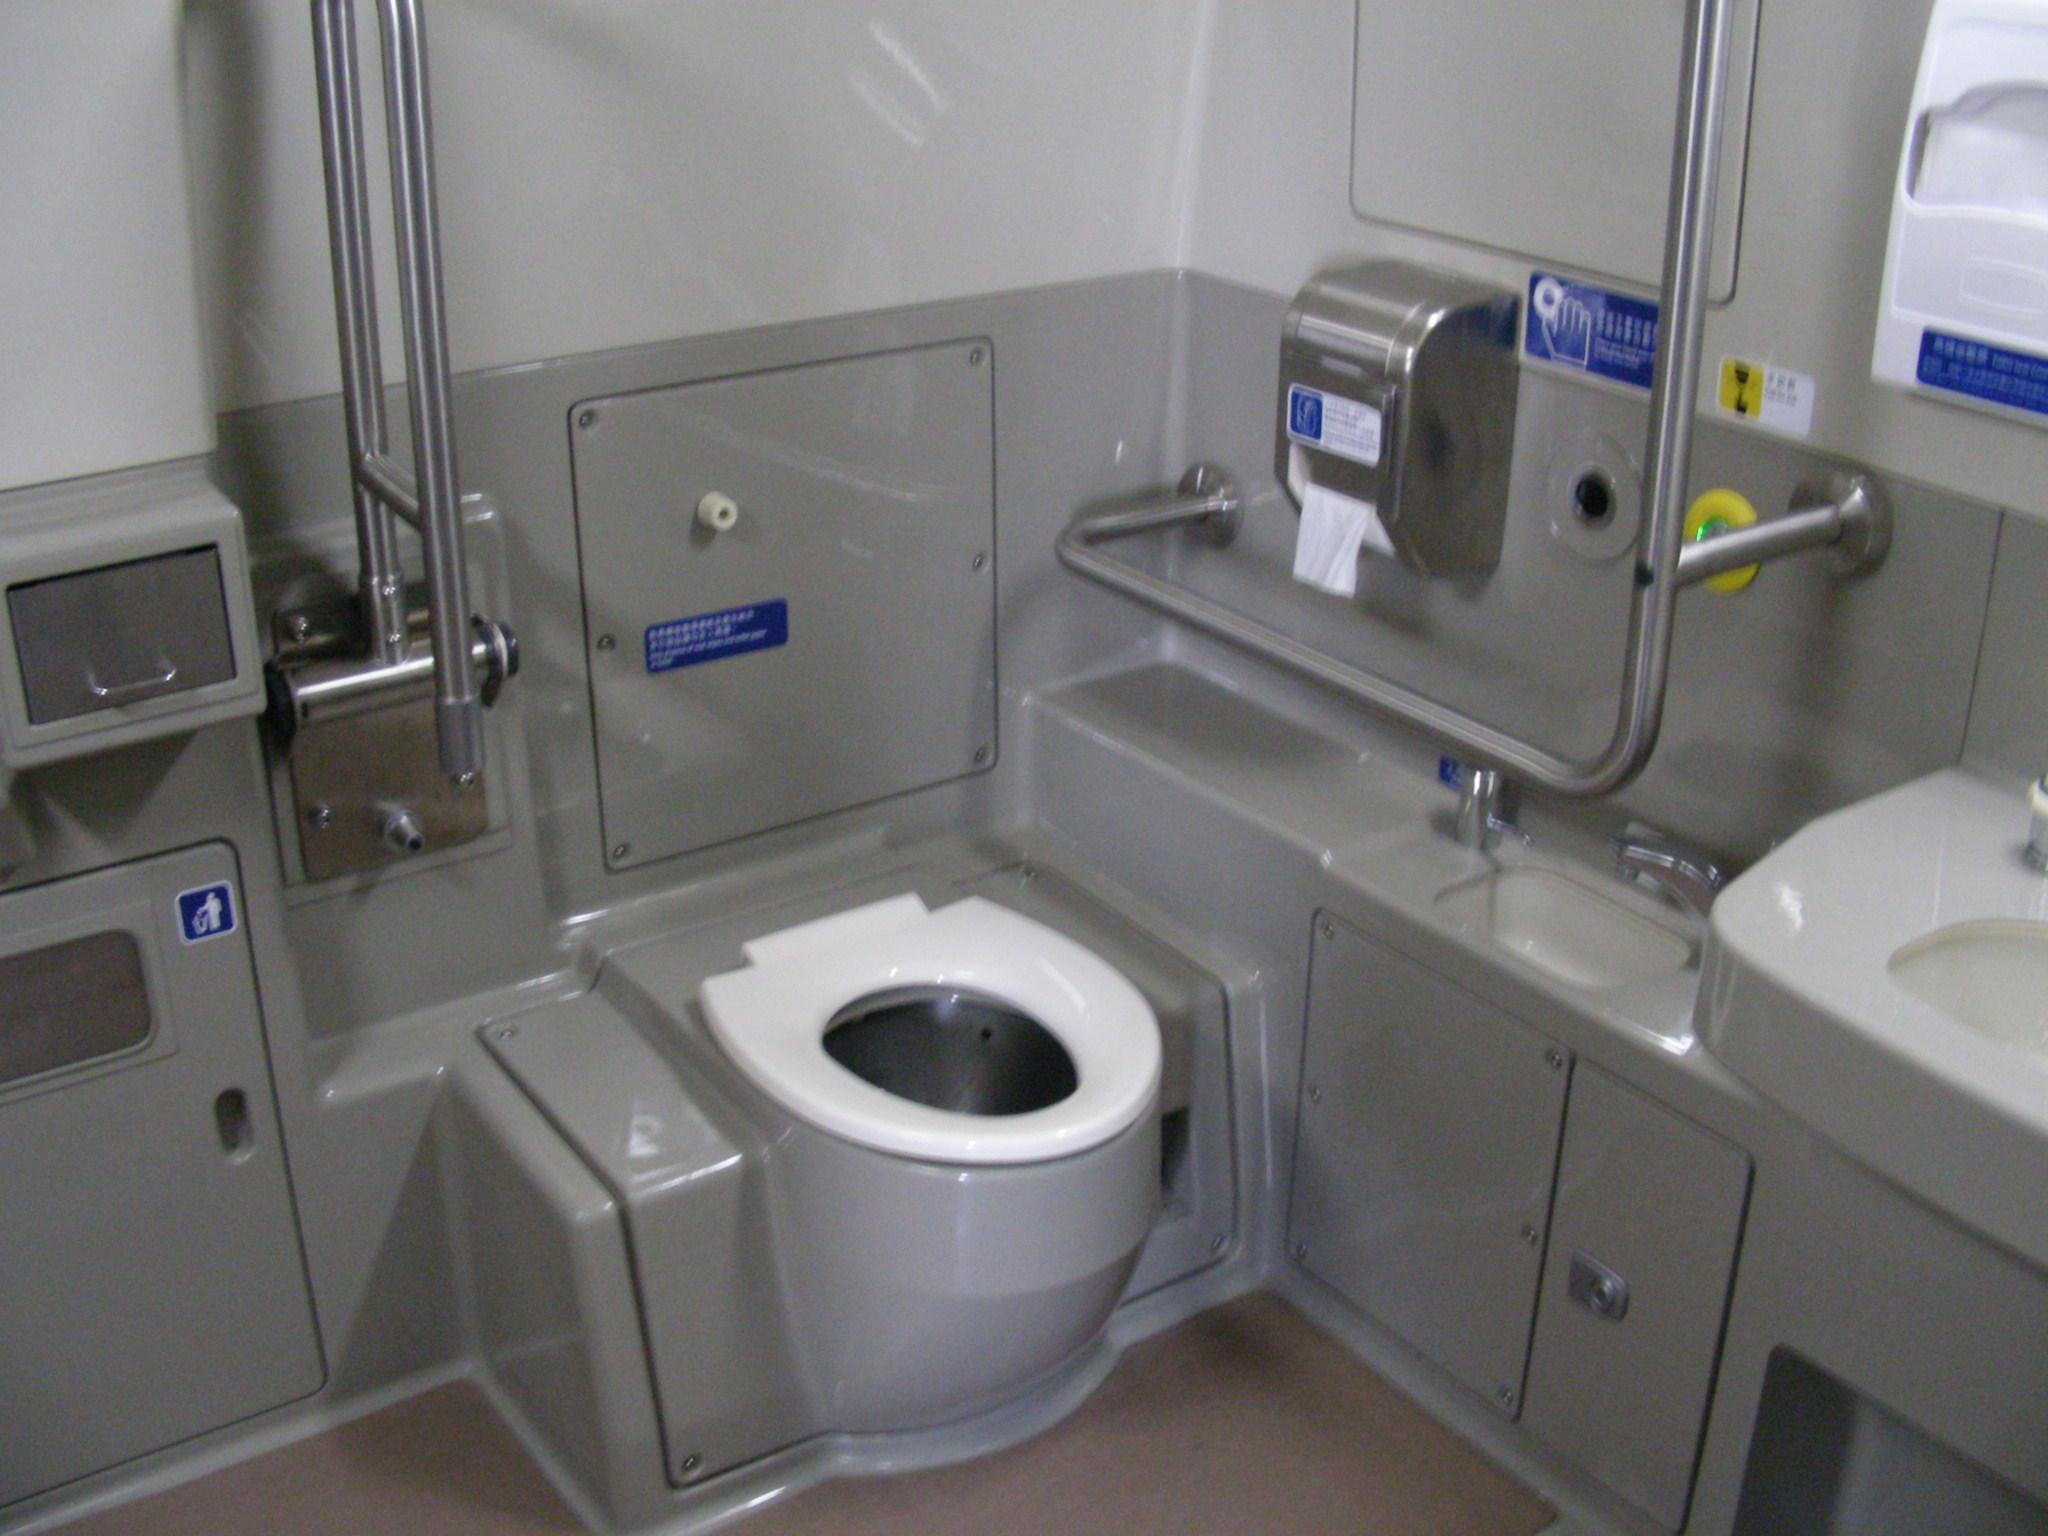 Bathroom Lavatories 28 Images Lavatories And Sinks Befon For Corner Sinks Sinks